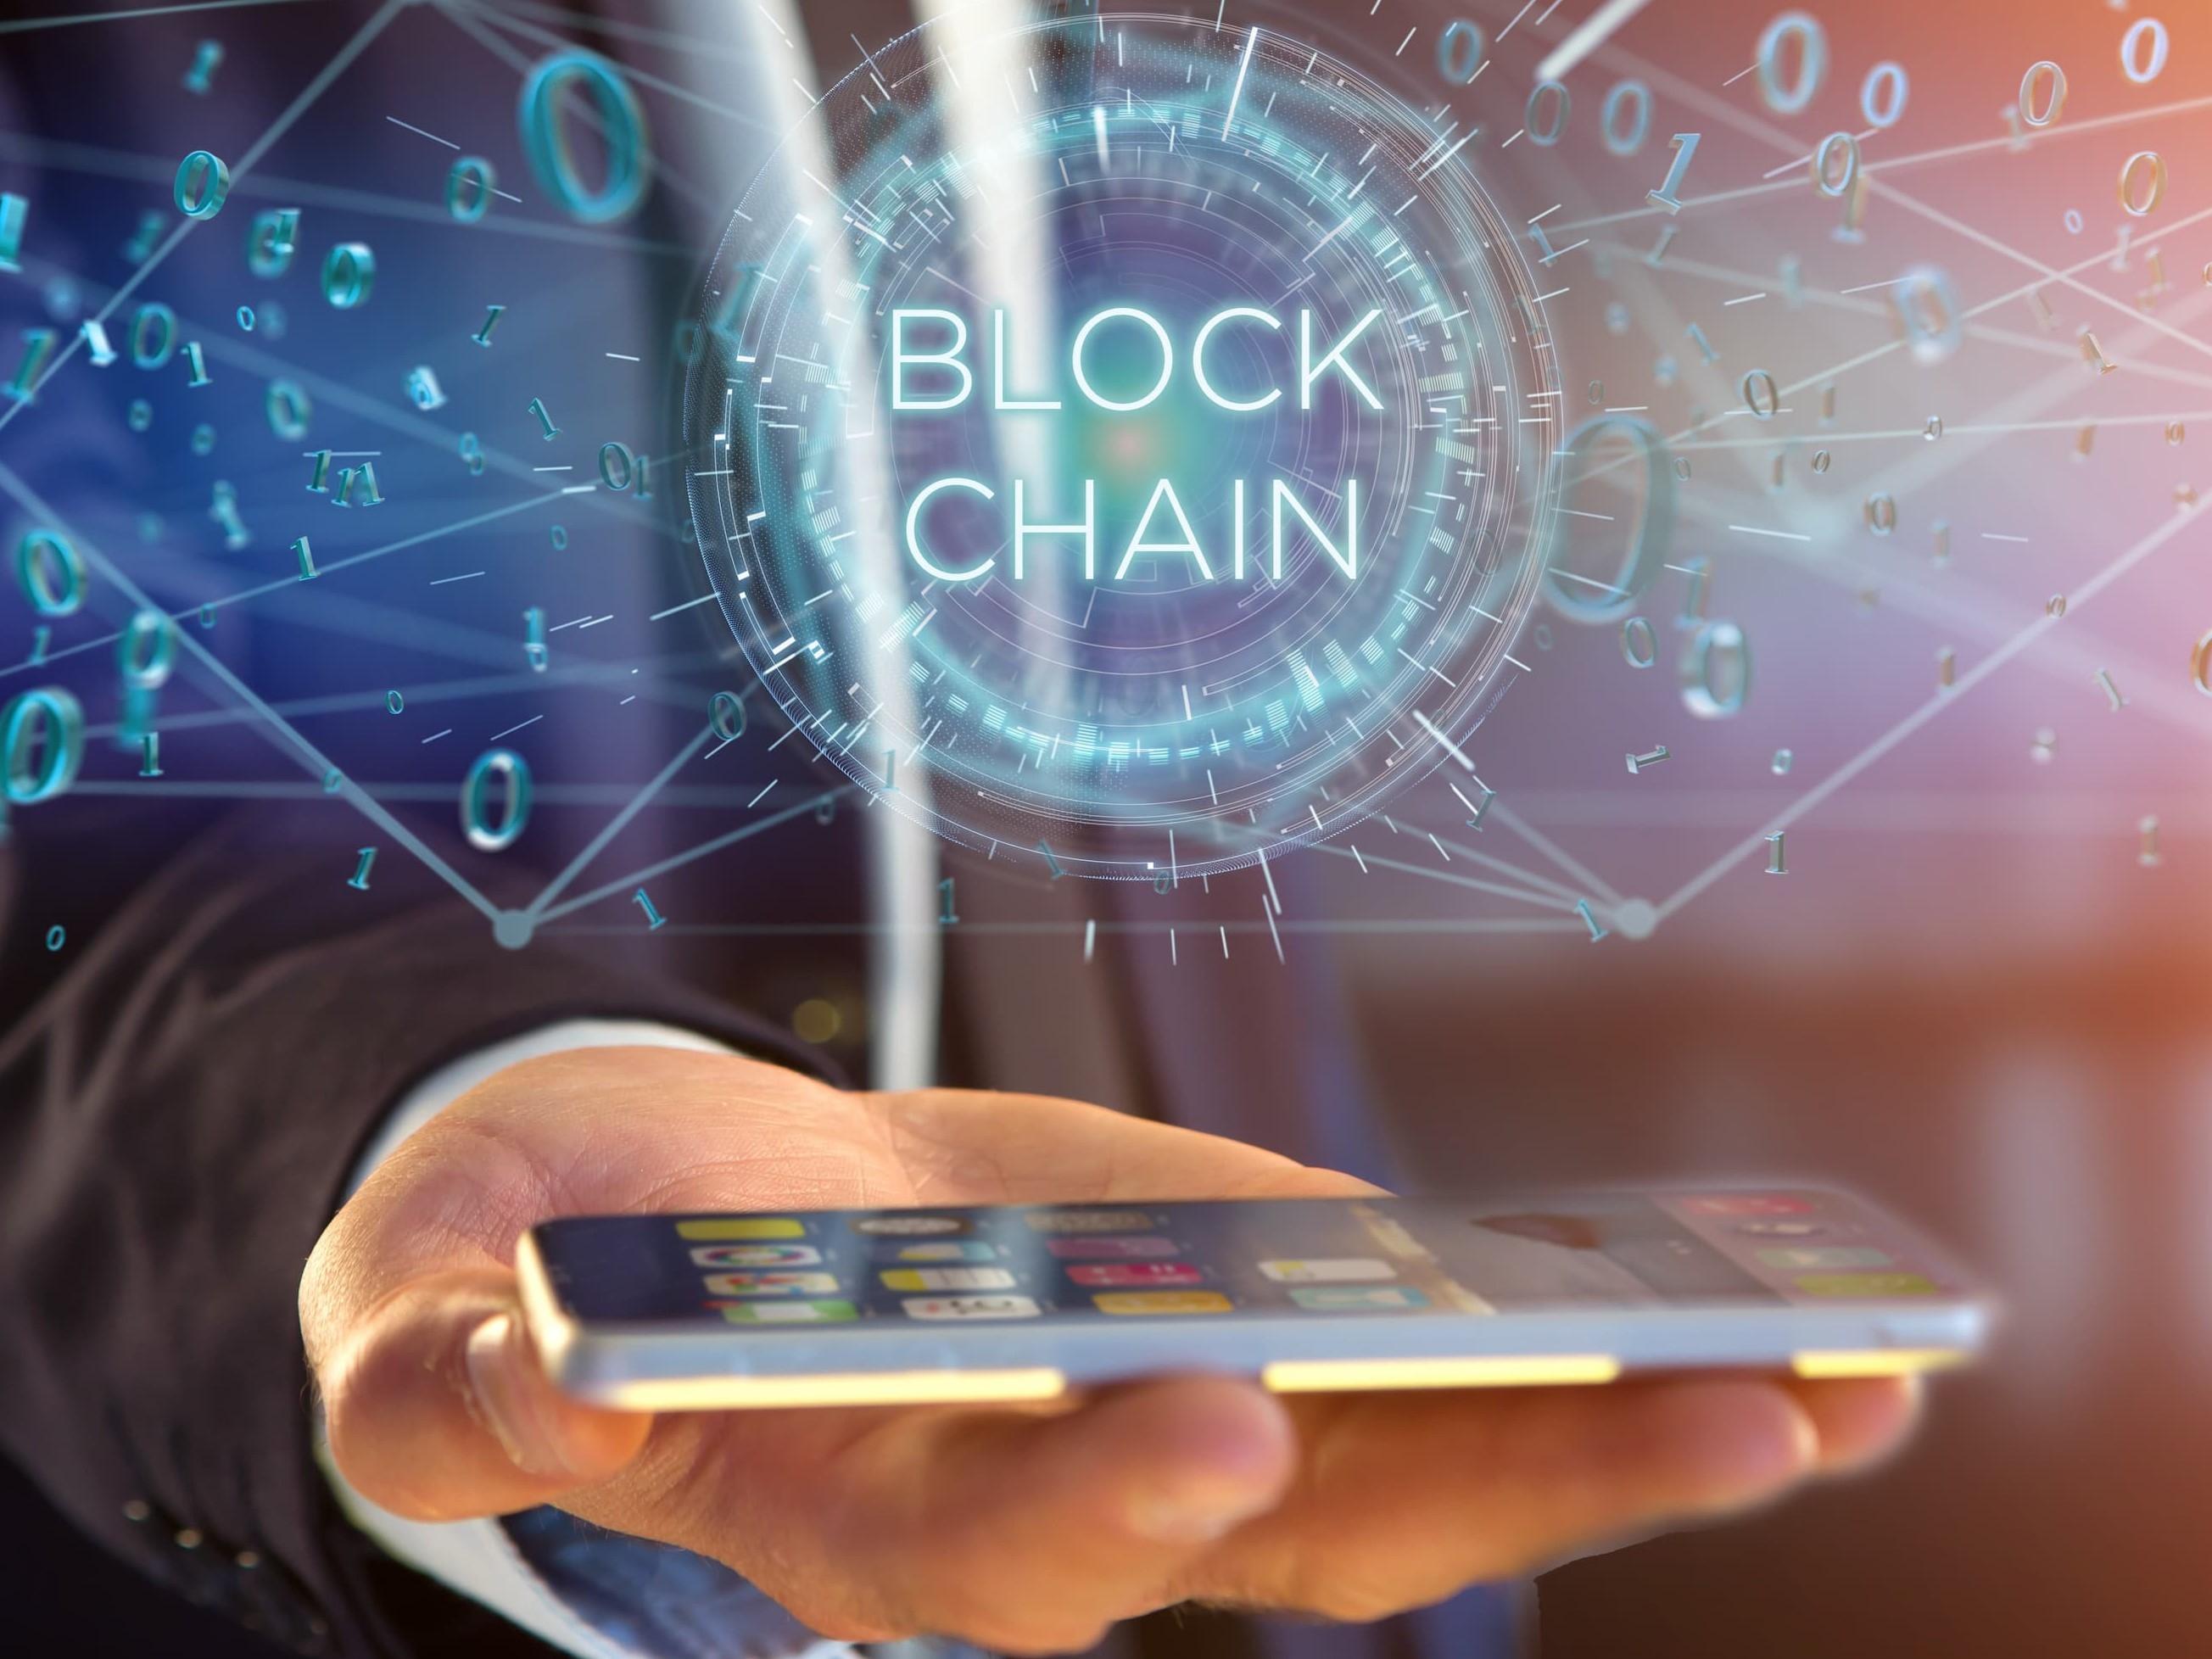 Blockchain & Mobiliteitsweek was groot succes